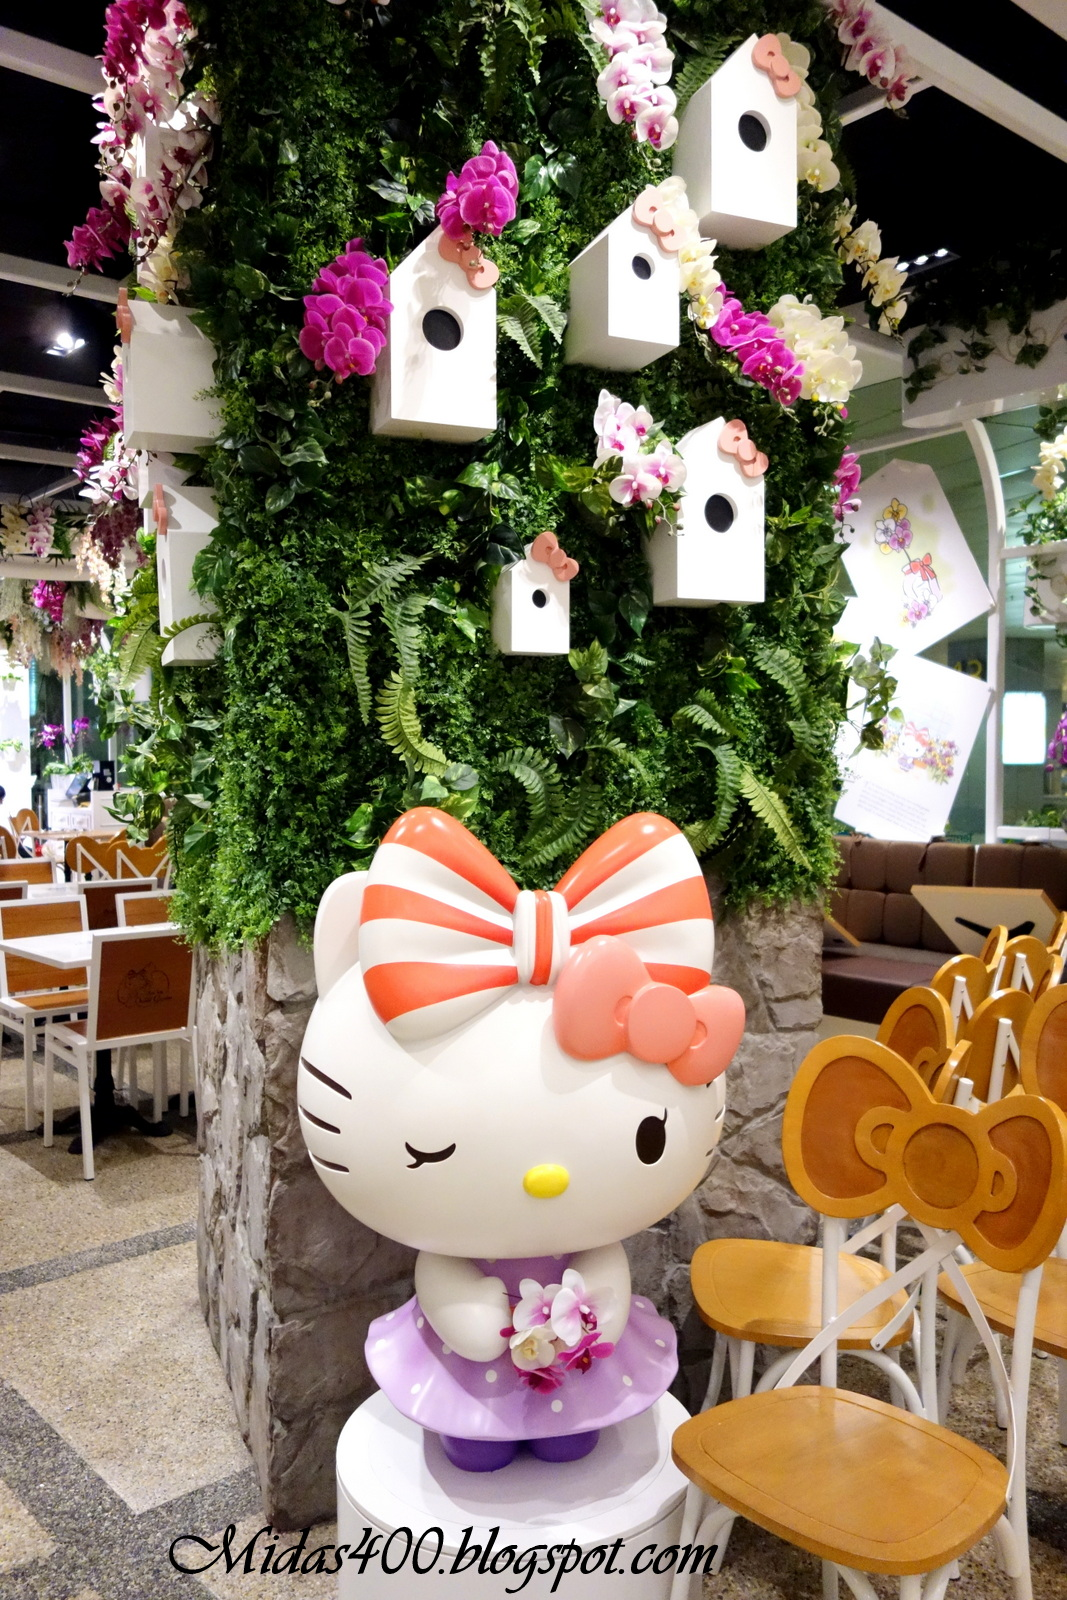 midas food n travel blog hello kitty orchid garden caf. Black Bedroom Furniture Sets. Home Design Ideas